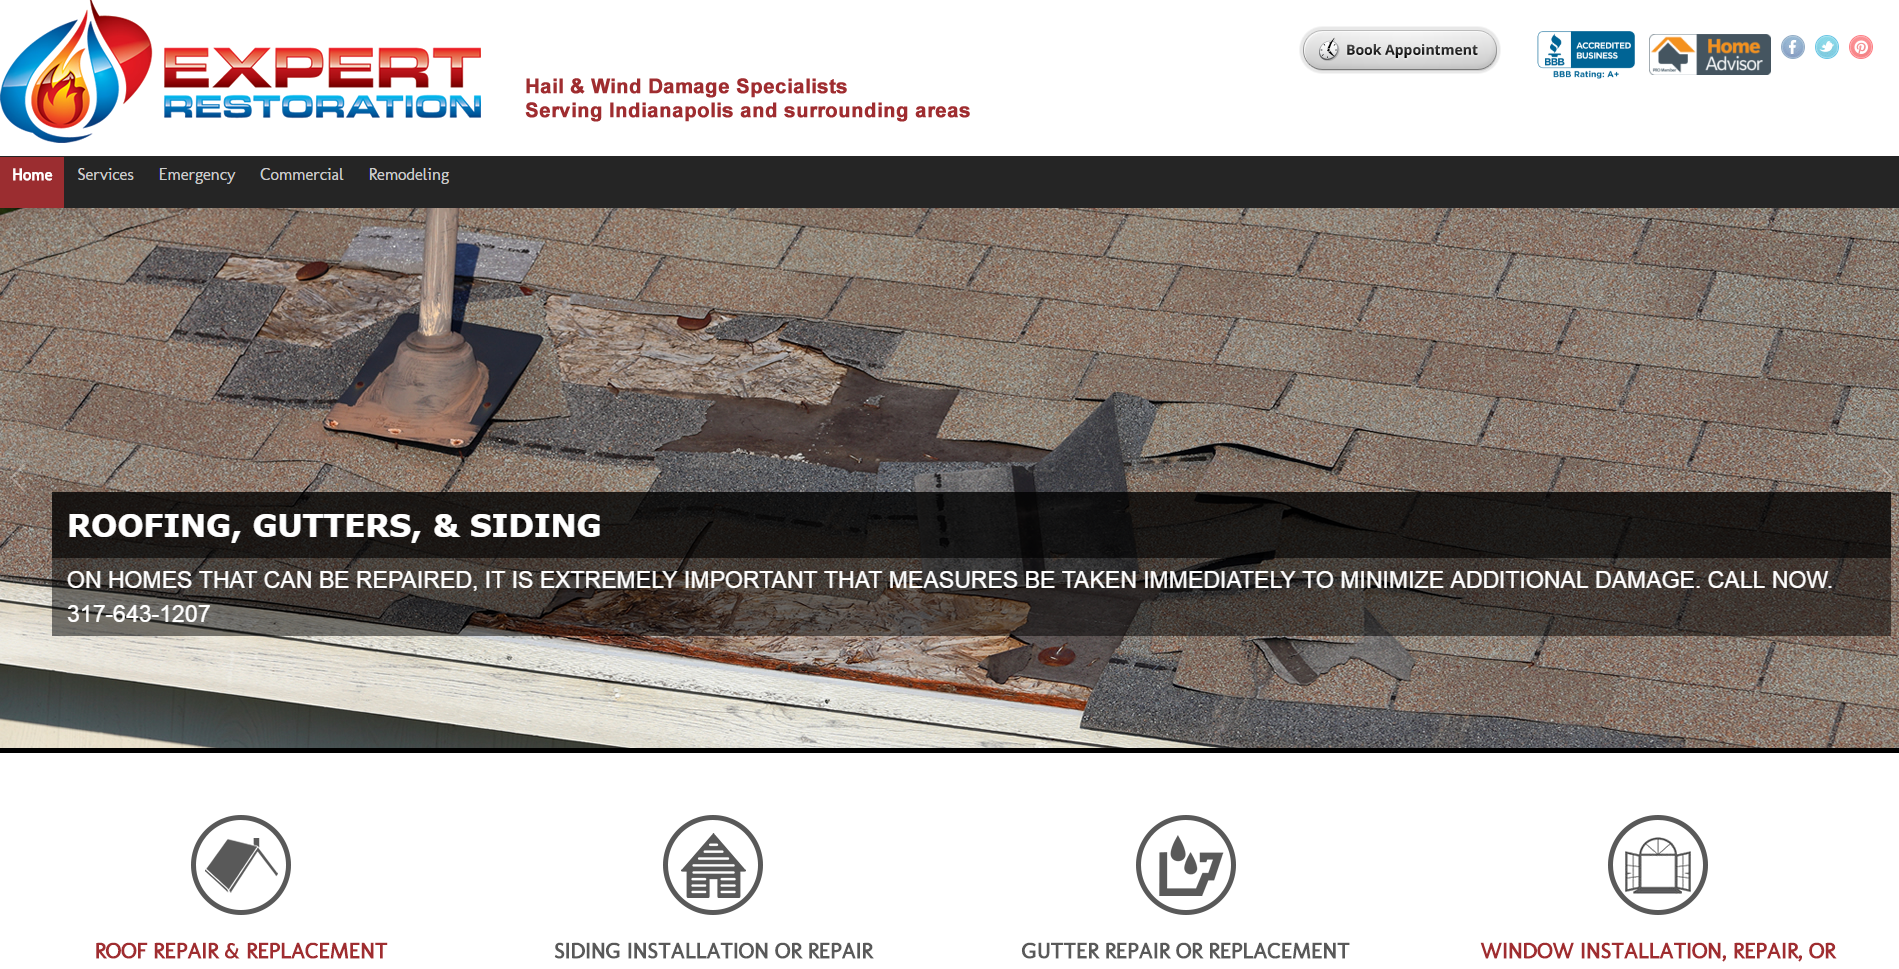 Expert Restoration Service